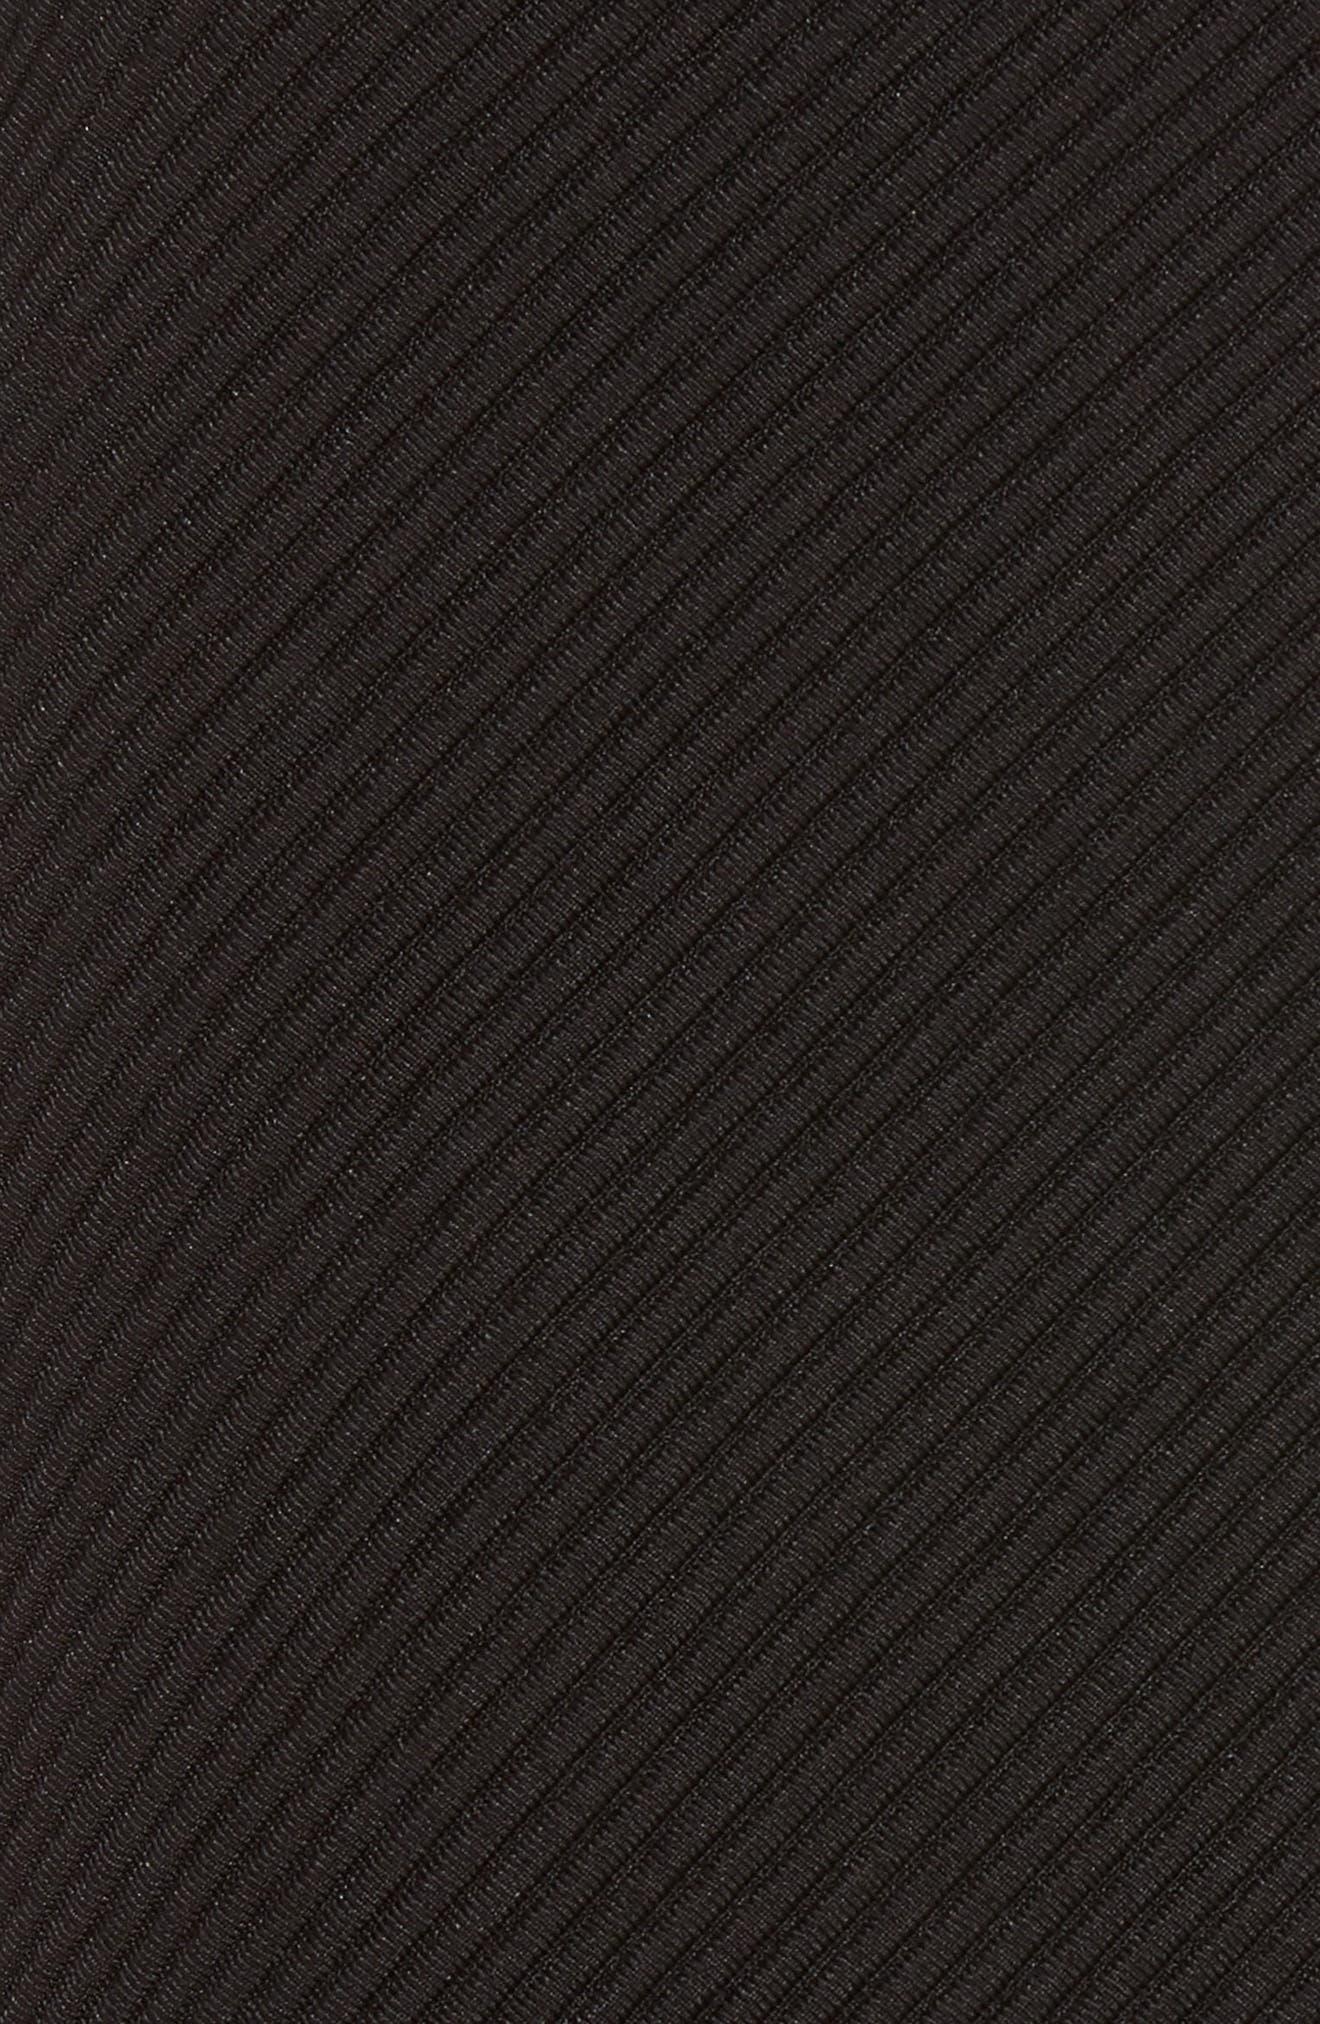 A-Line Knit Miniskirt,                             Alternate thumbnail 5, color,                             Black